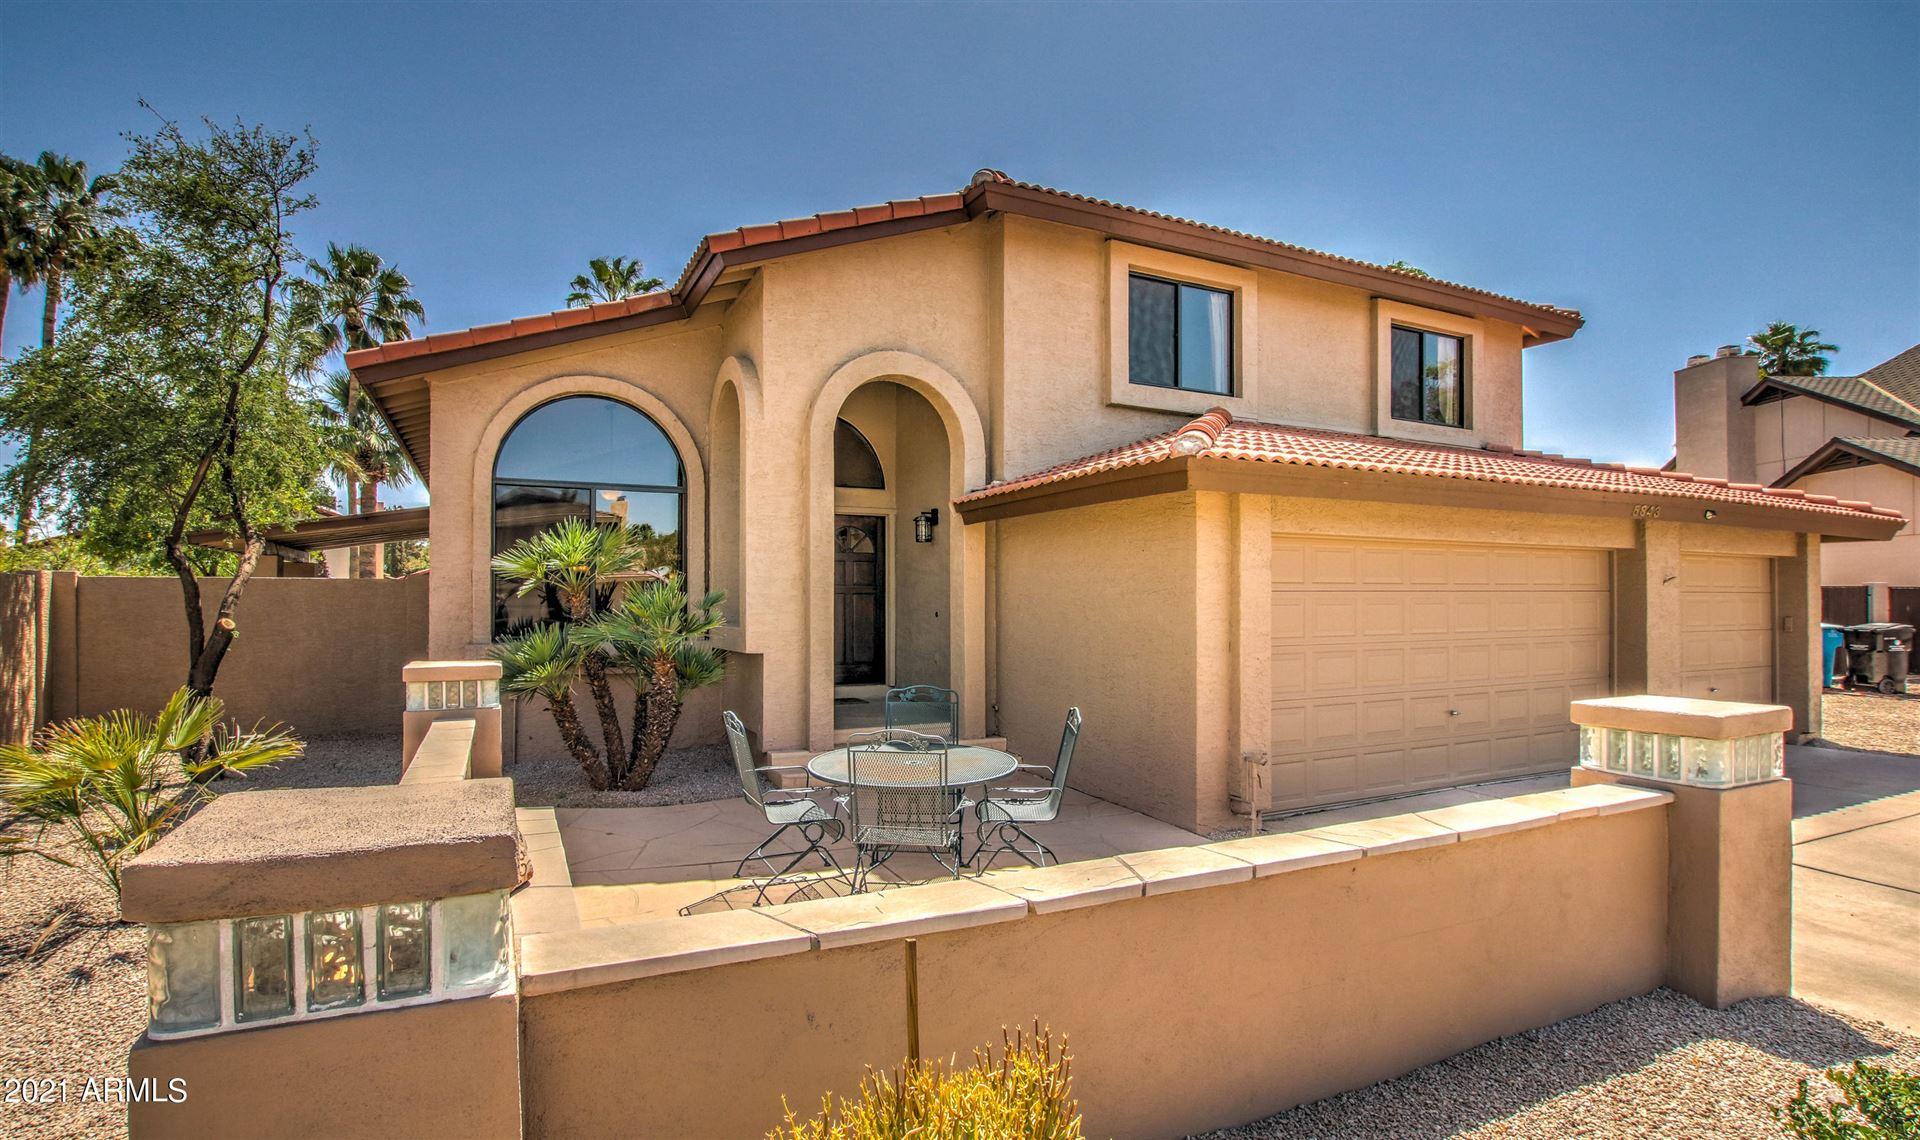 5843 E KATHLEEN Road, Scottsdale, AZ 85254 - MLS#: 6234762